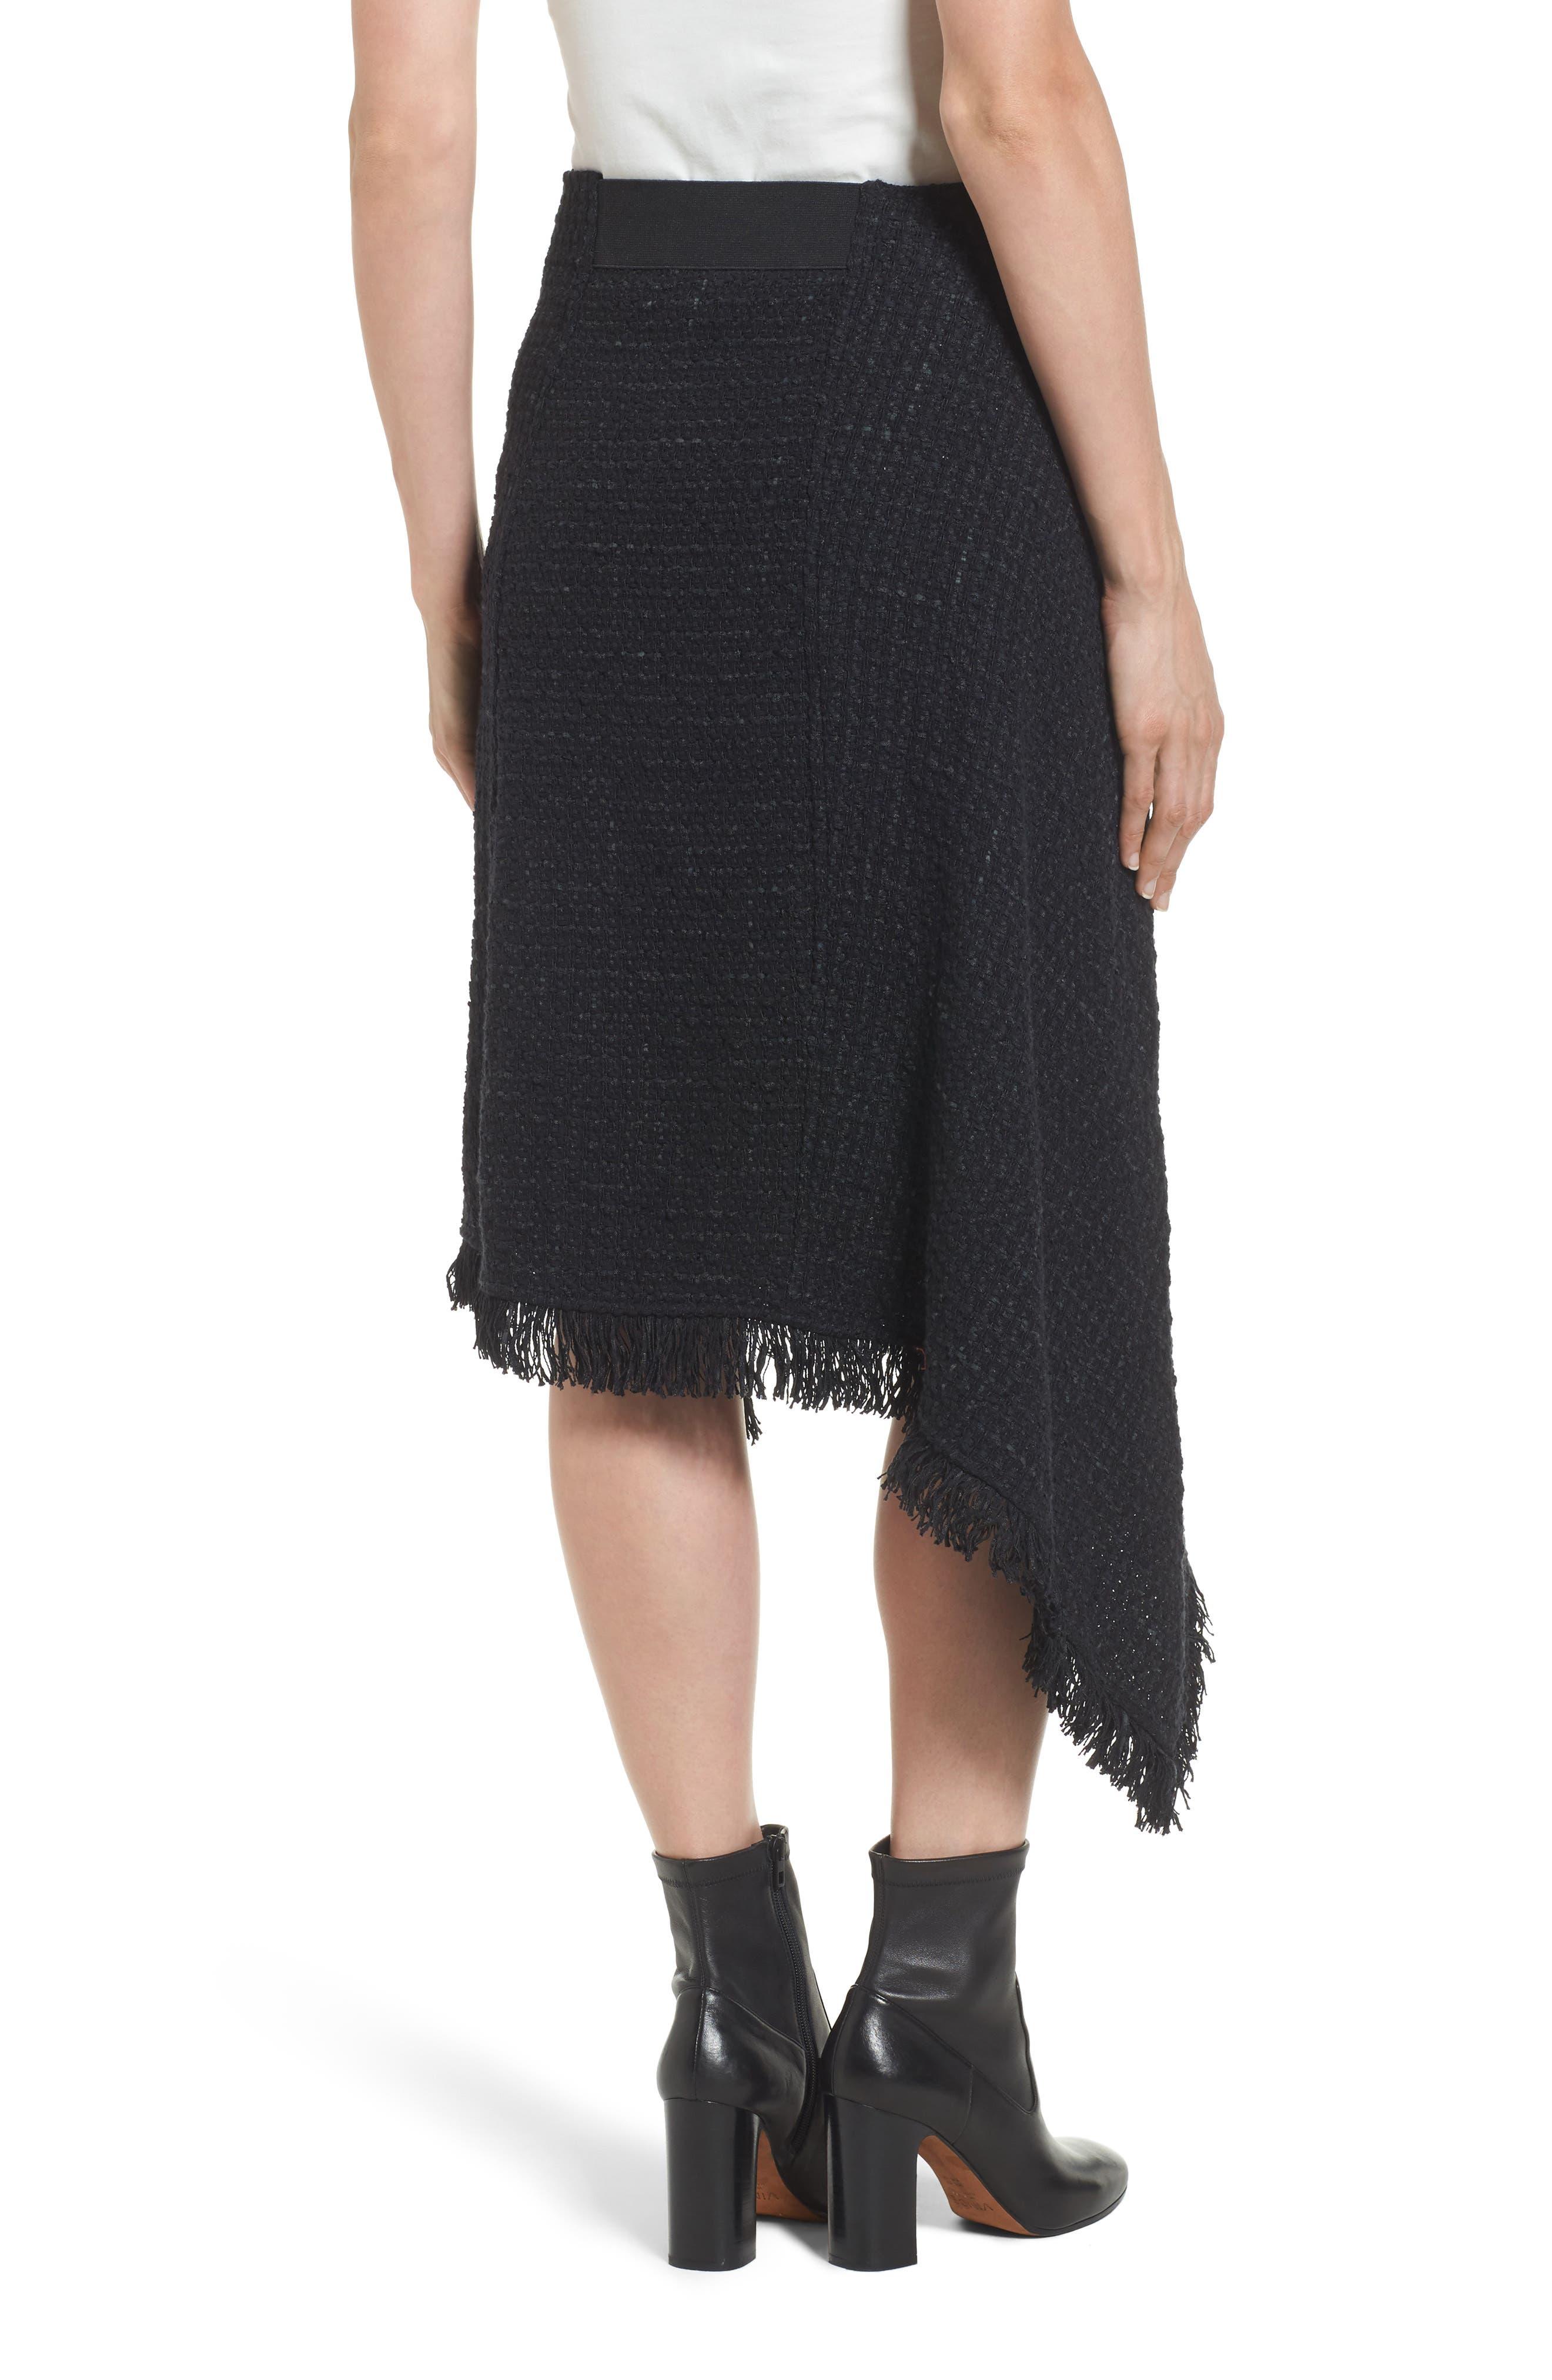 NIC + ZOE Majestic Tweed Skirt,                             Alternate thumbnail 2, color,                             004